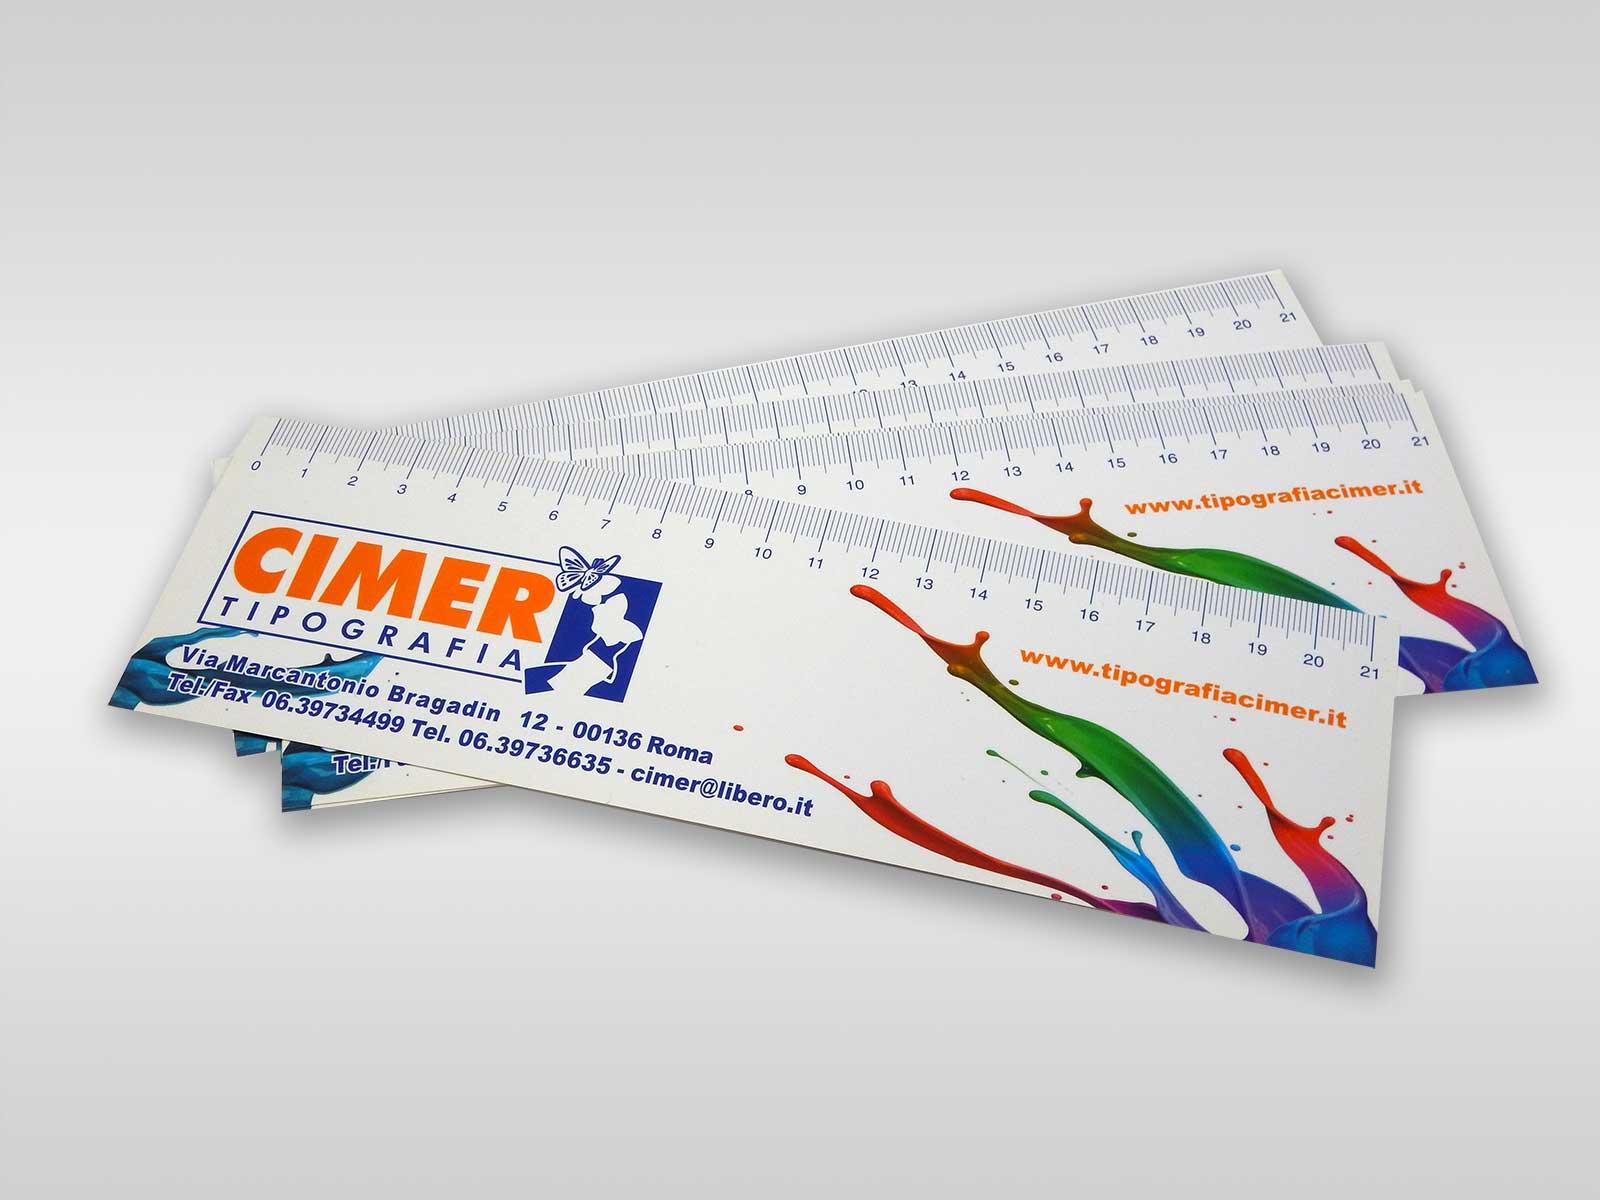 https://www.tipografiacimer.it/project/cimer/